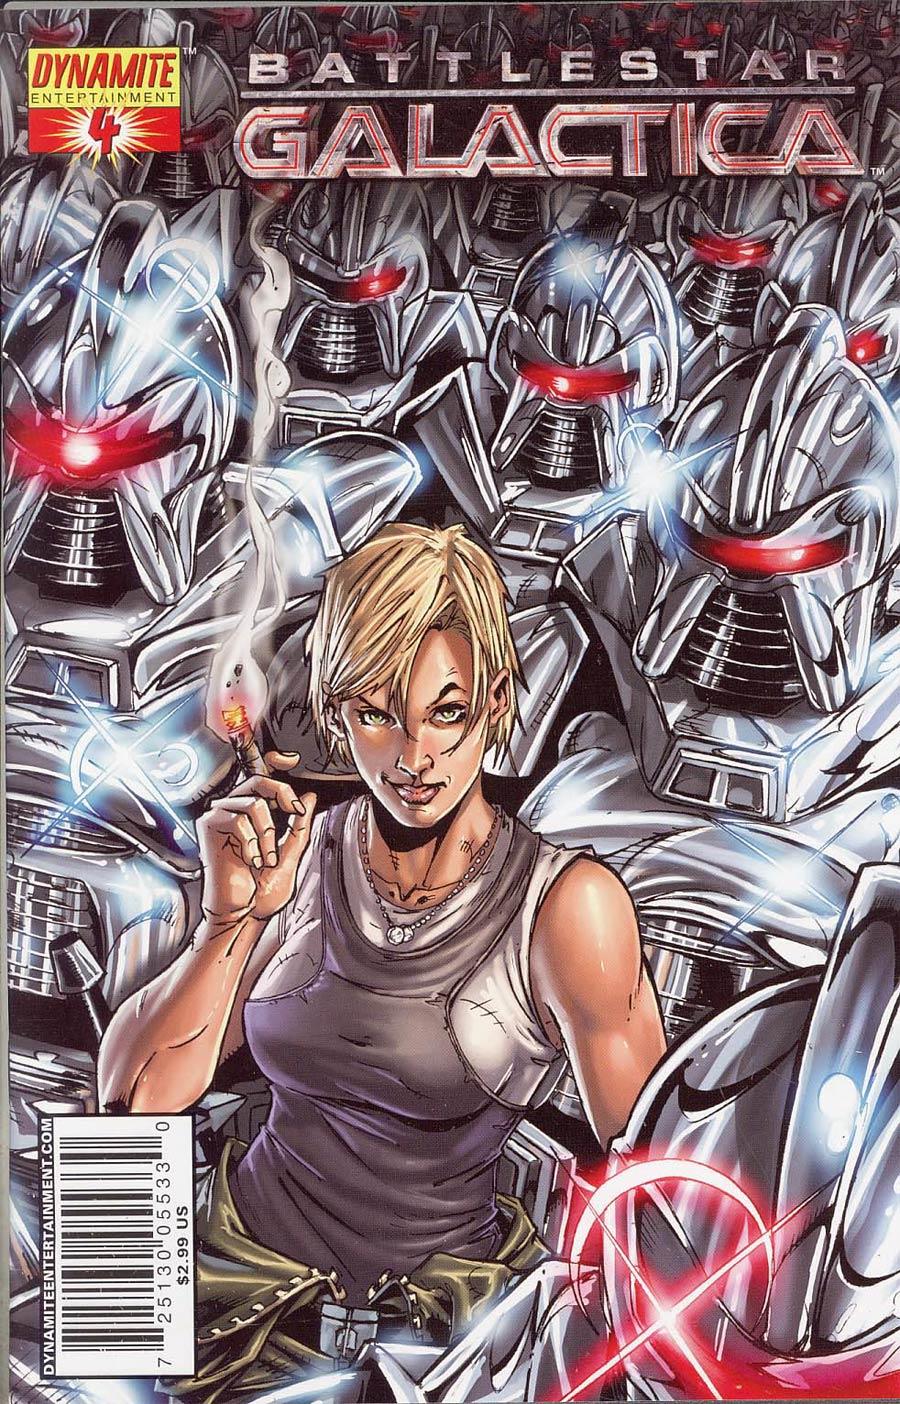 Battlestar Galactica Vol 4 #4 Cover B Nigel Raynor